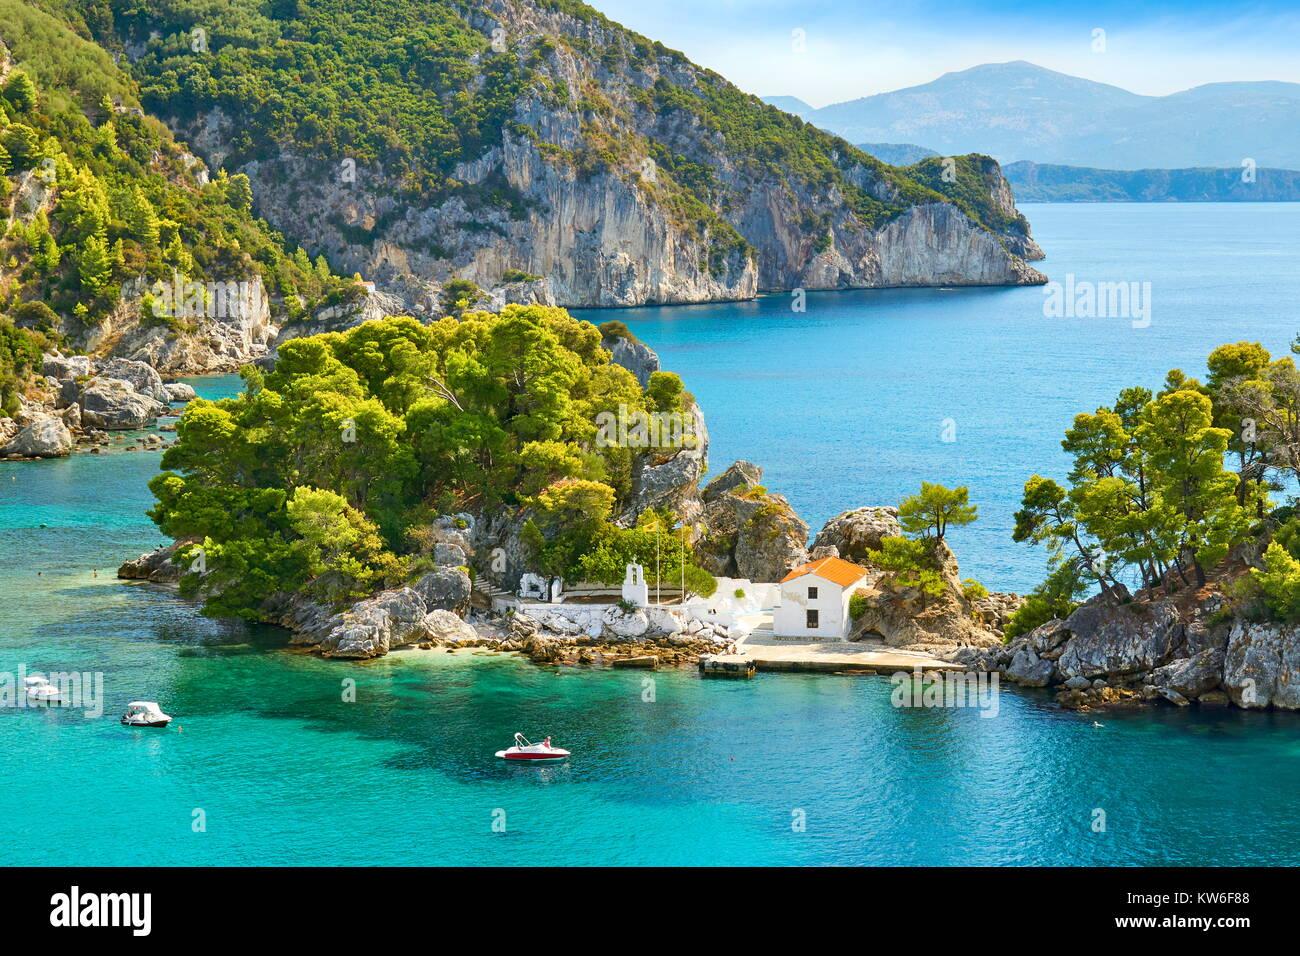 La piccola cappella a Isola di Panagias, Parga, Grecia Immagini Stock